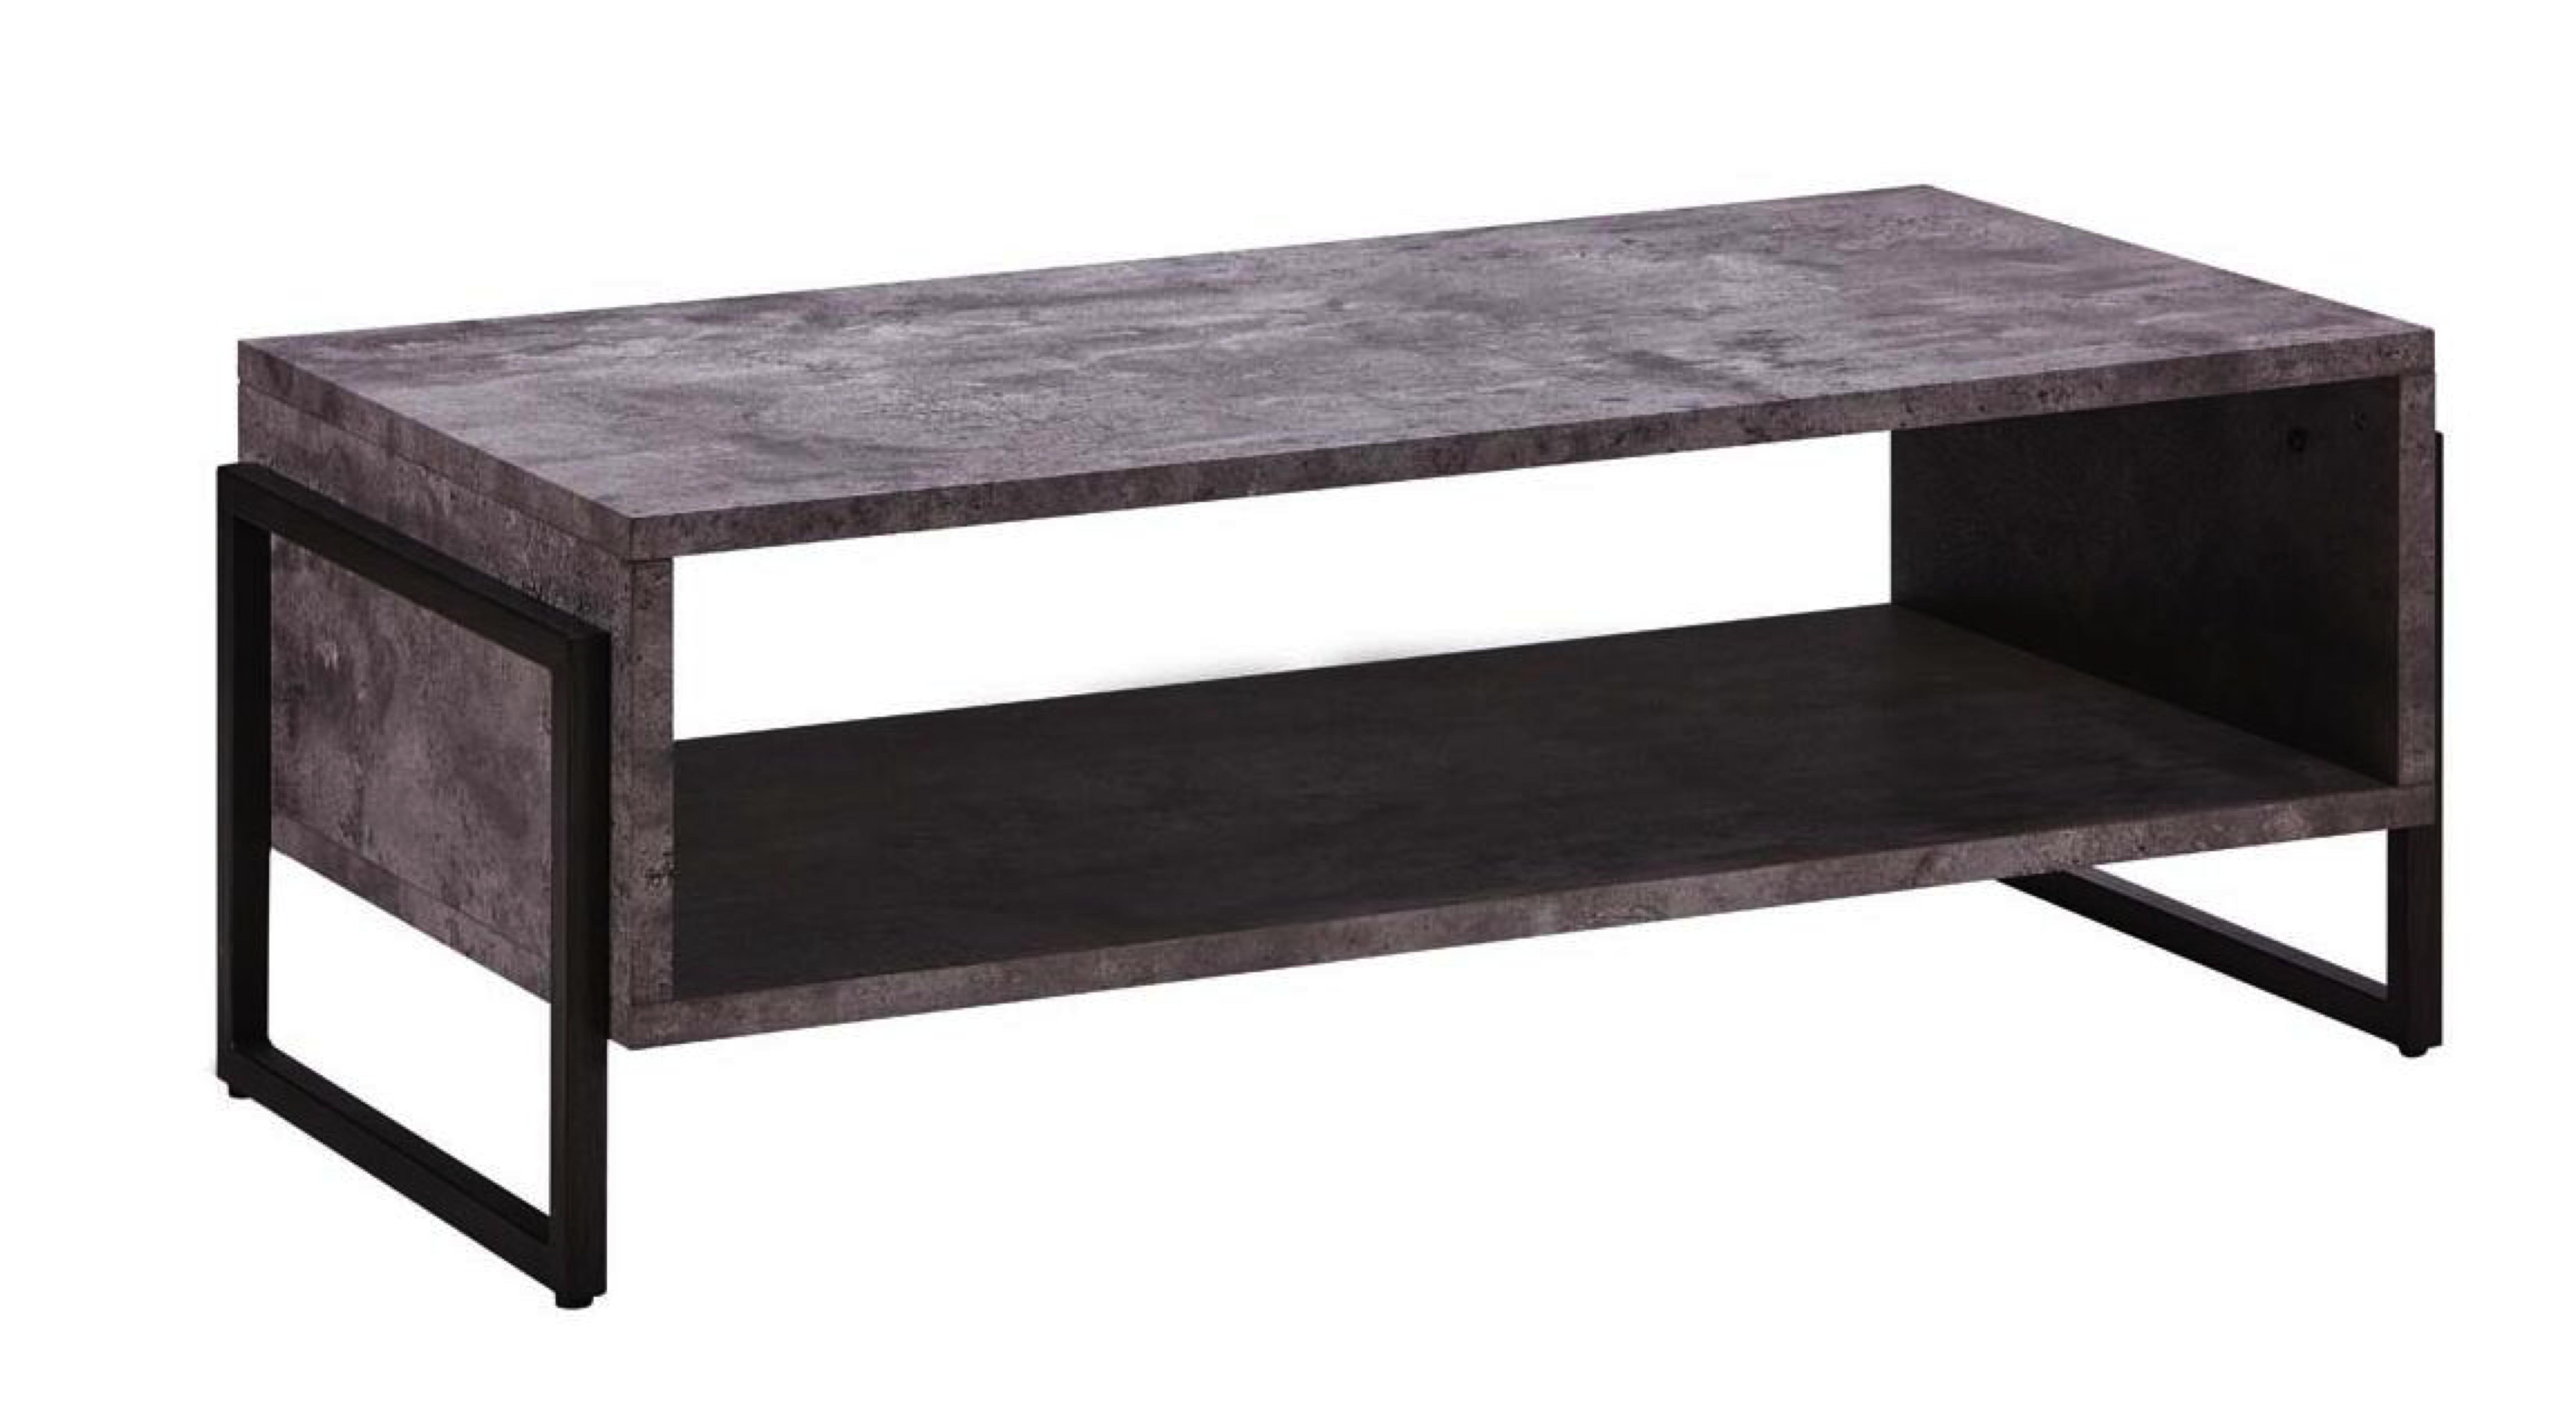 Table imitation beton photos de conception de maison for Table exterieur imitation beton